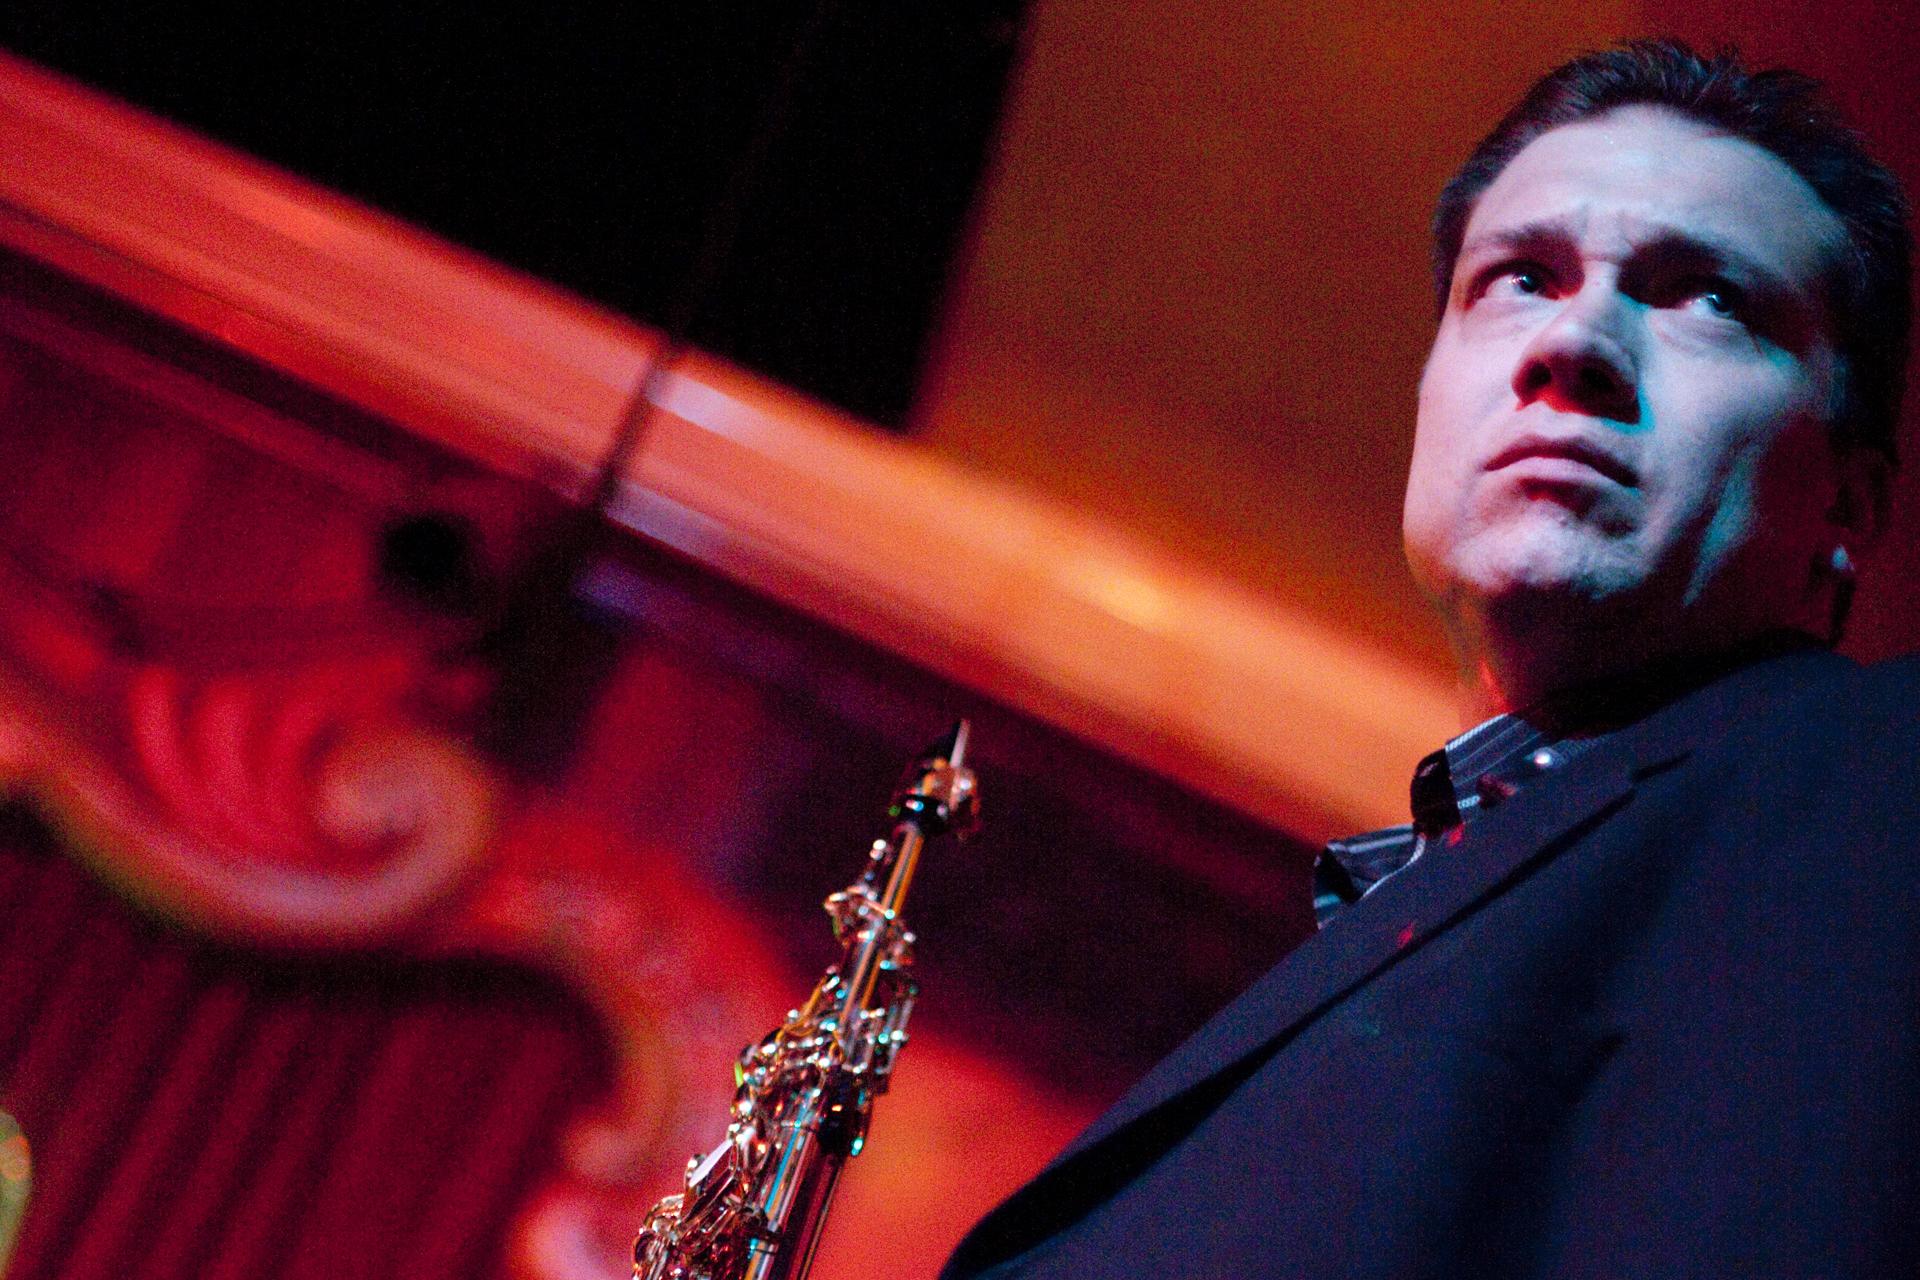 John Wojciechowski Quartet - Saturday, September 26, 6:00-7:00pmWagner Stage